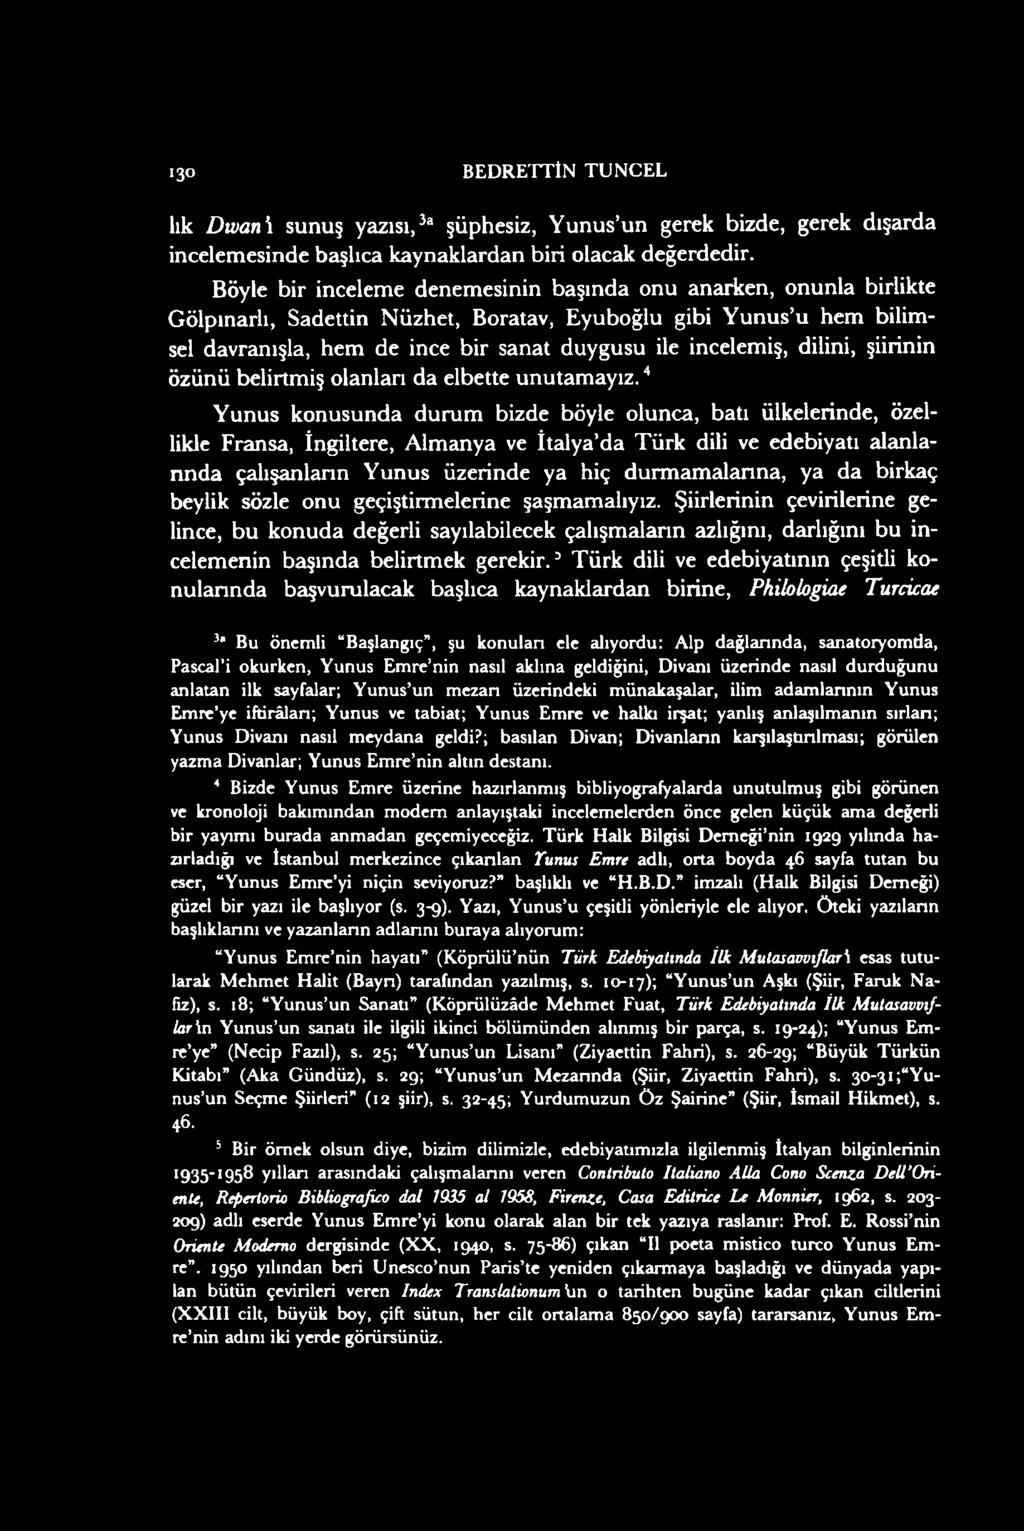 Fransizca Da Yunus Emre* - Pdf Free Download à Salon Bas De Jardin Pas Cher